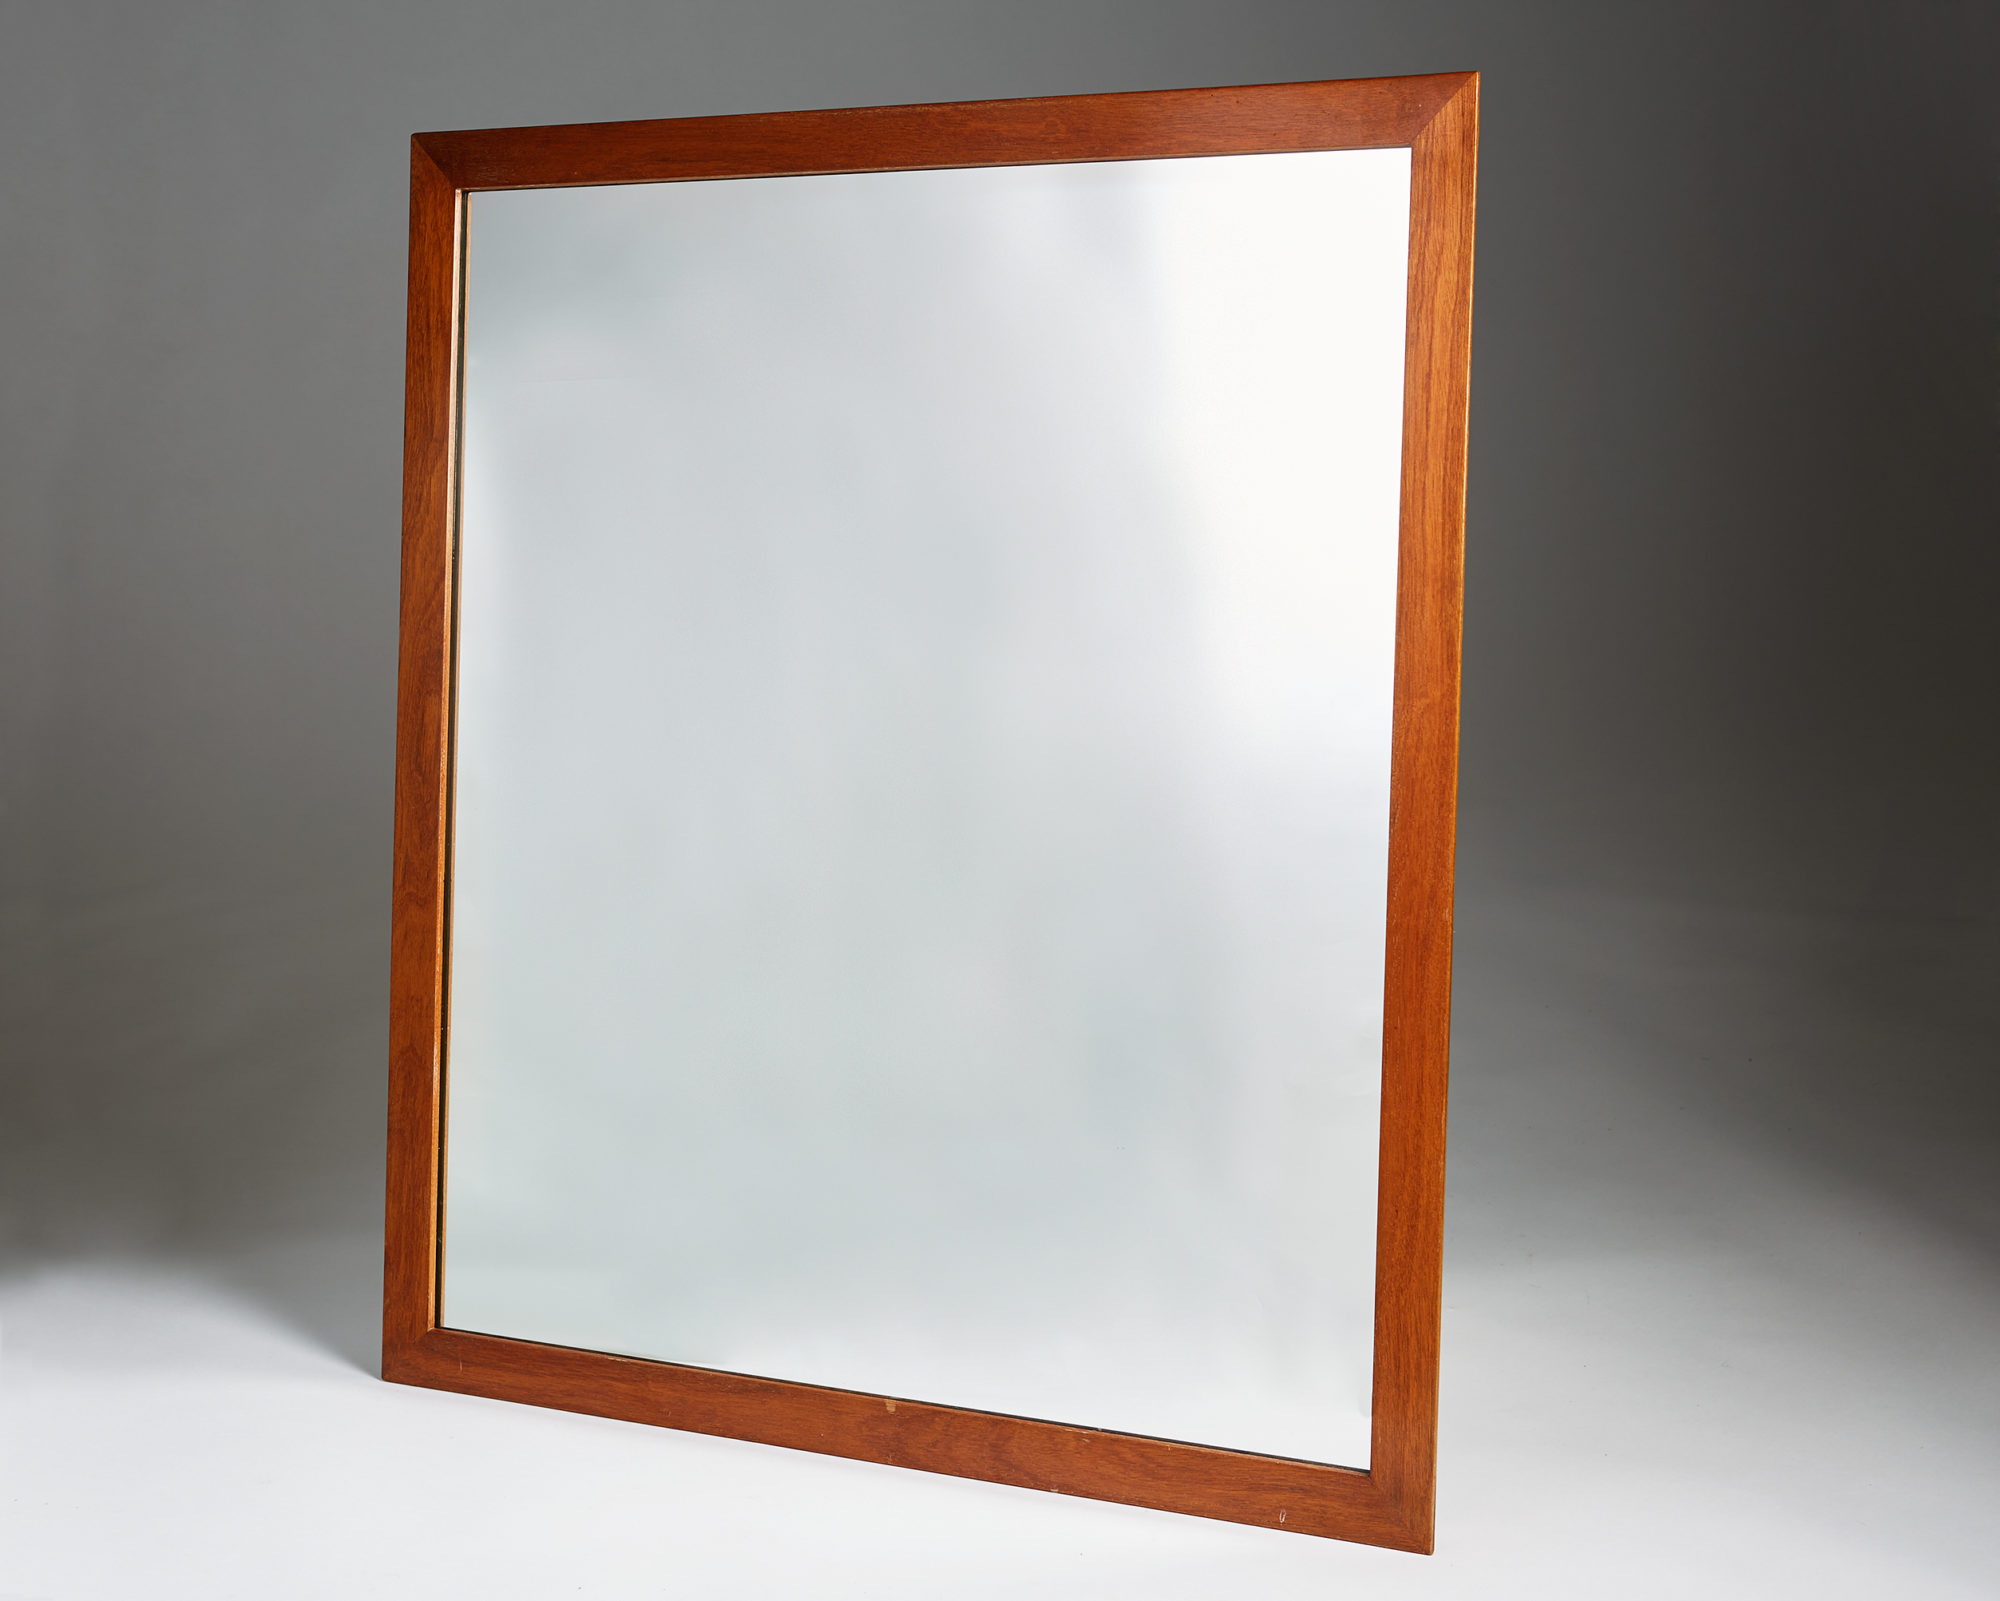 Mirror designed by Josef Frank for Svenskt Tenn, Sweden. 1950's. by Modernity on curated-crowd.com